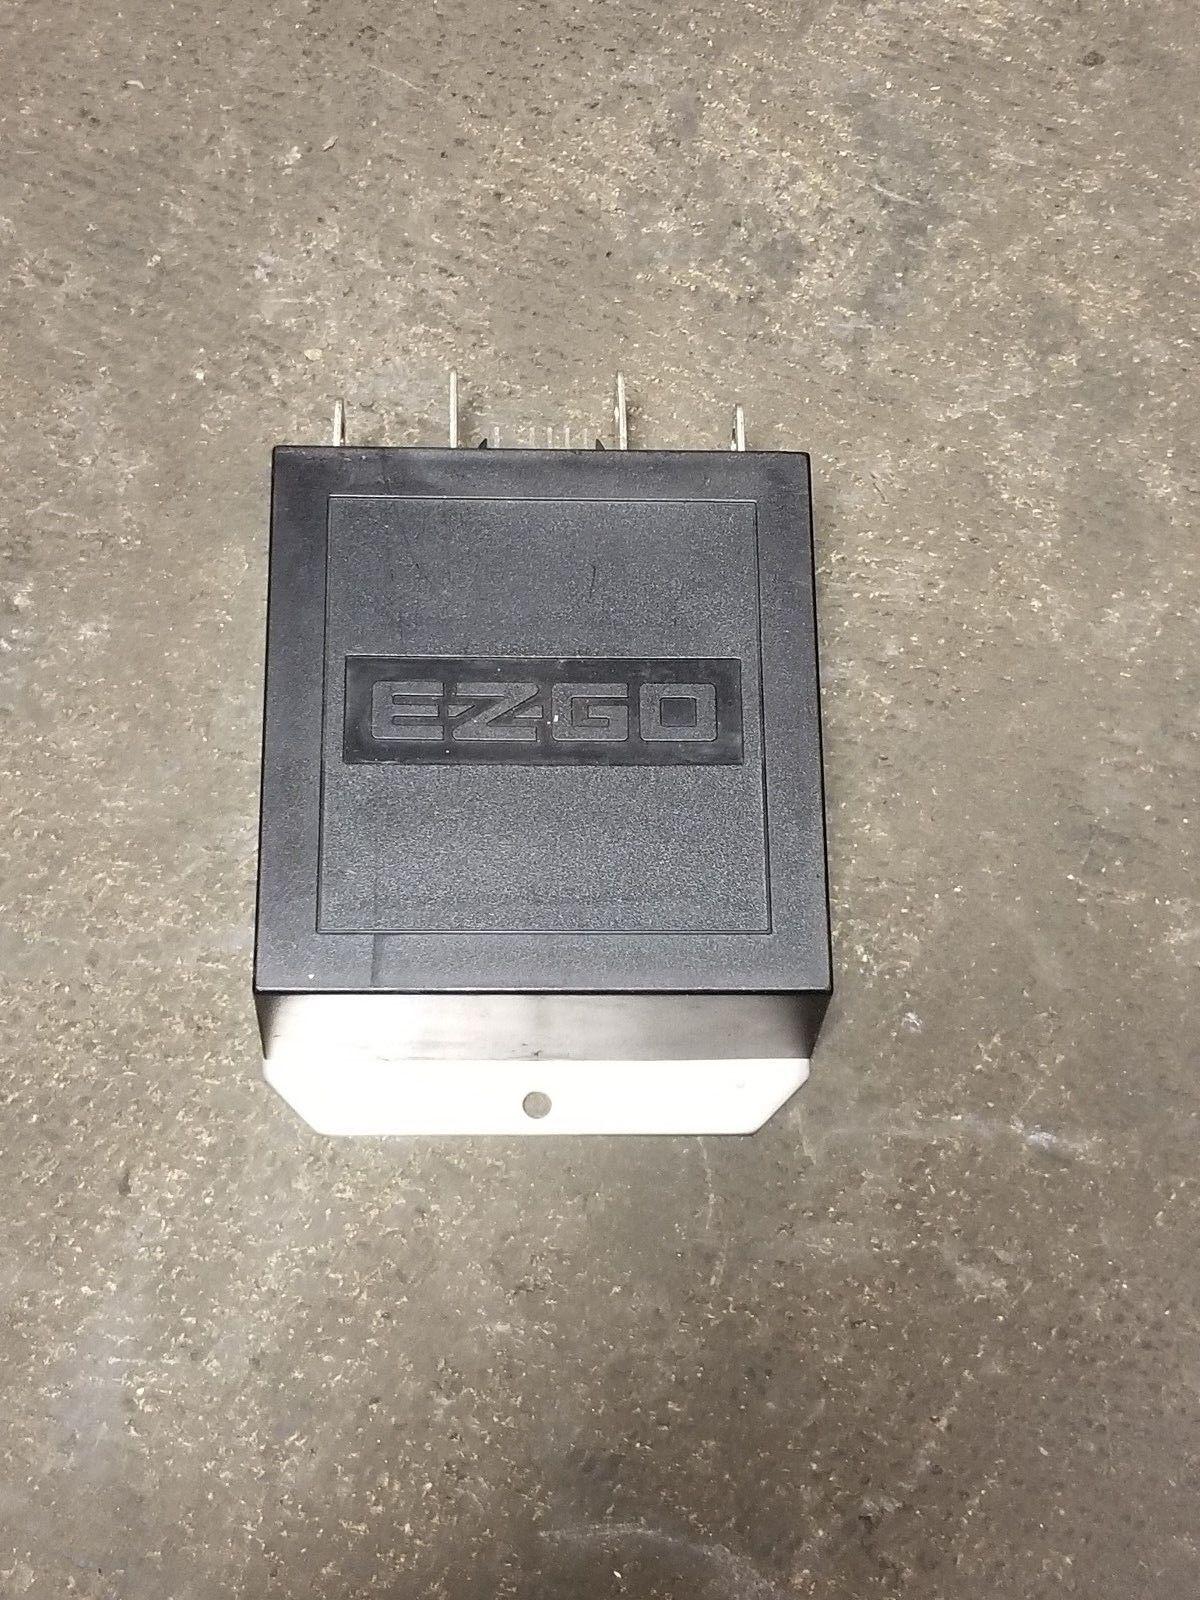 medium resolution of ezgo curtis 36v 36 volt motor controller txt series 1206 5 pin golf cart car forklift parts and accessories